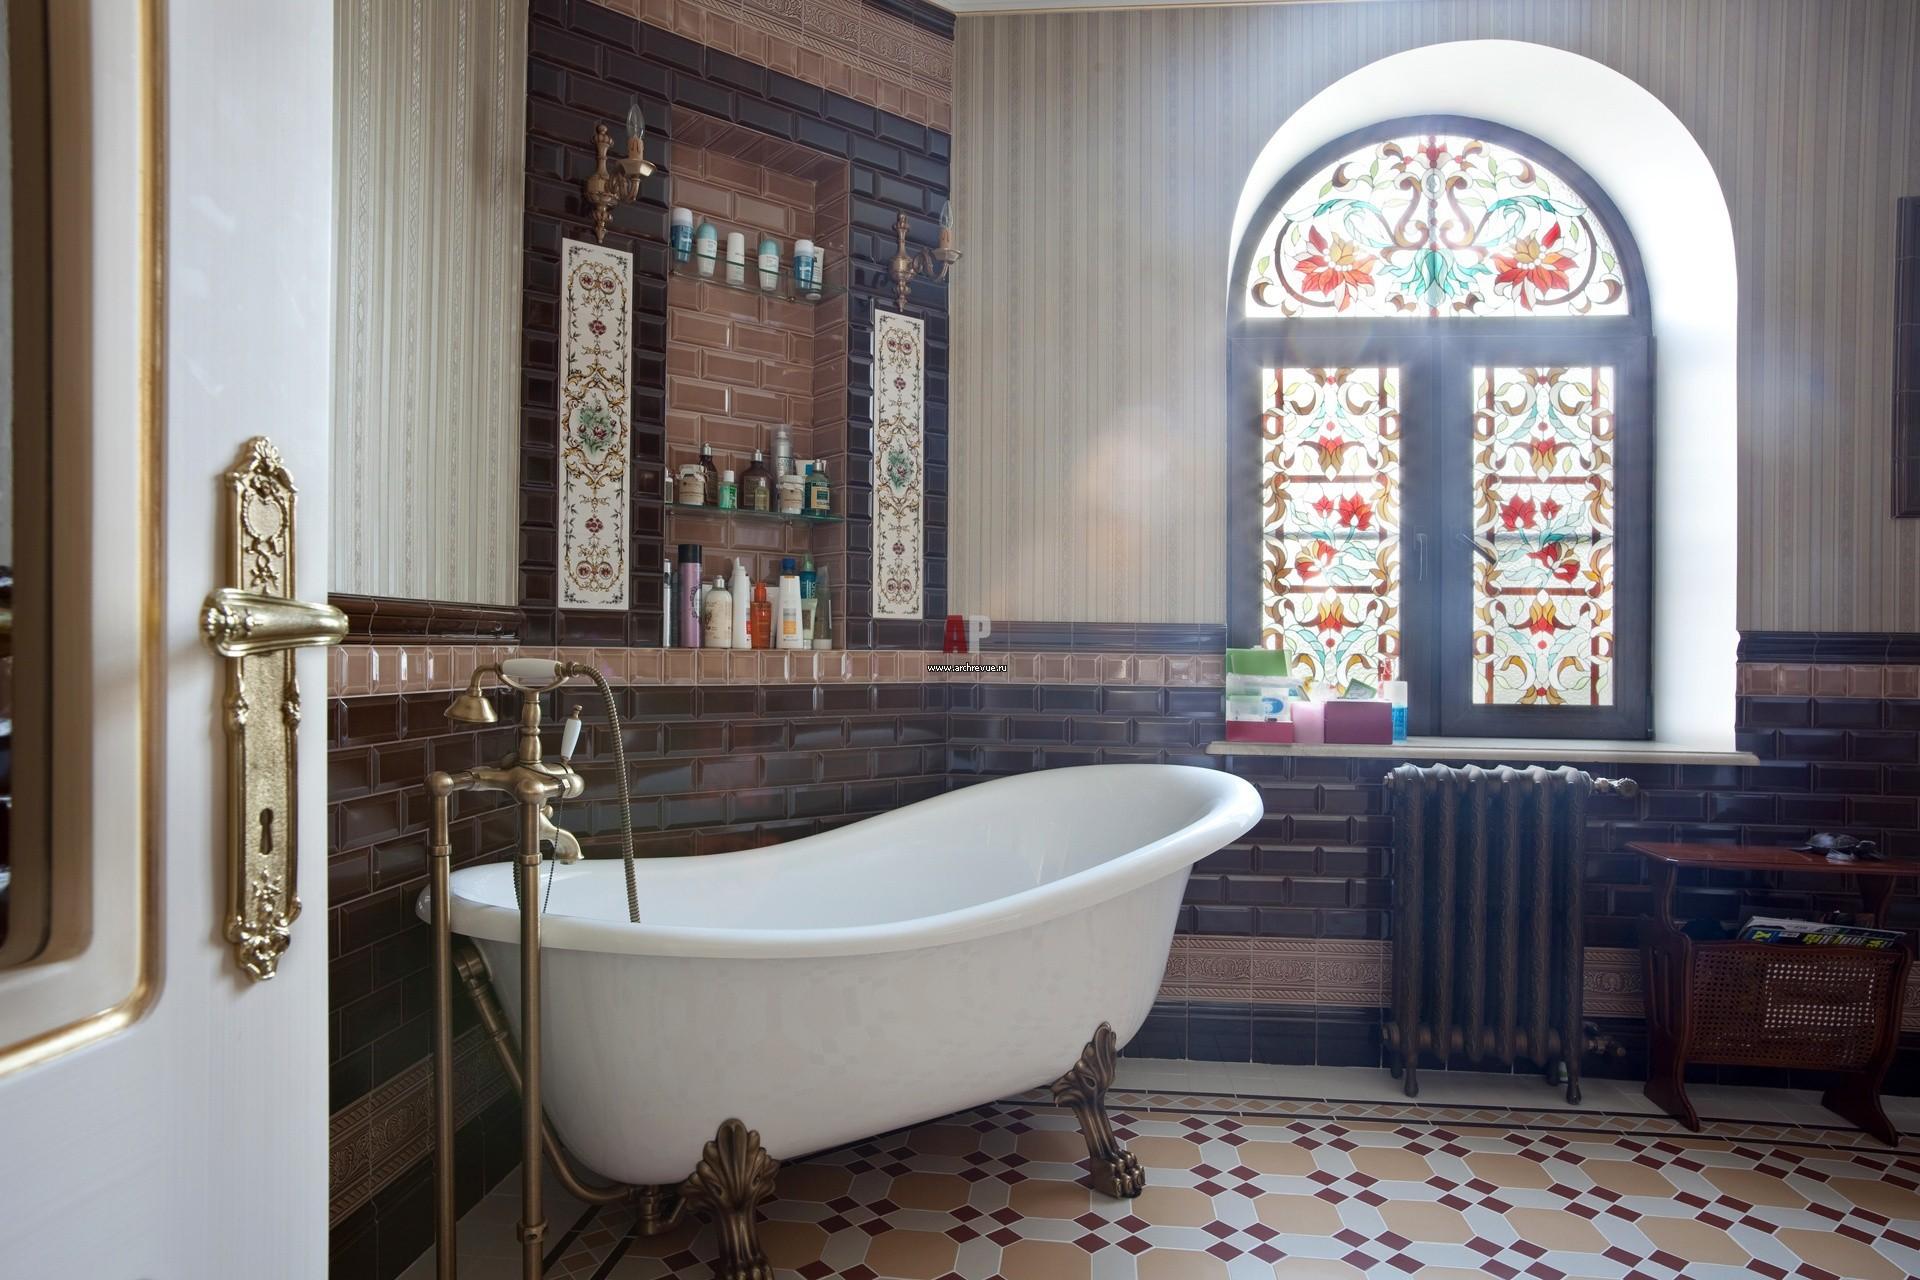 Витражи на окнах в викторианском стиле